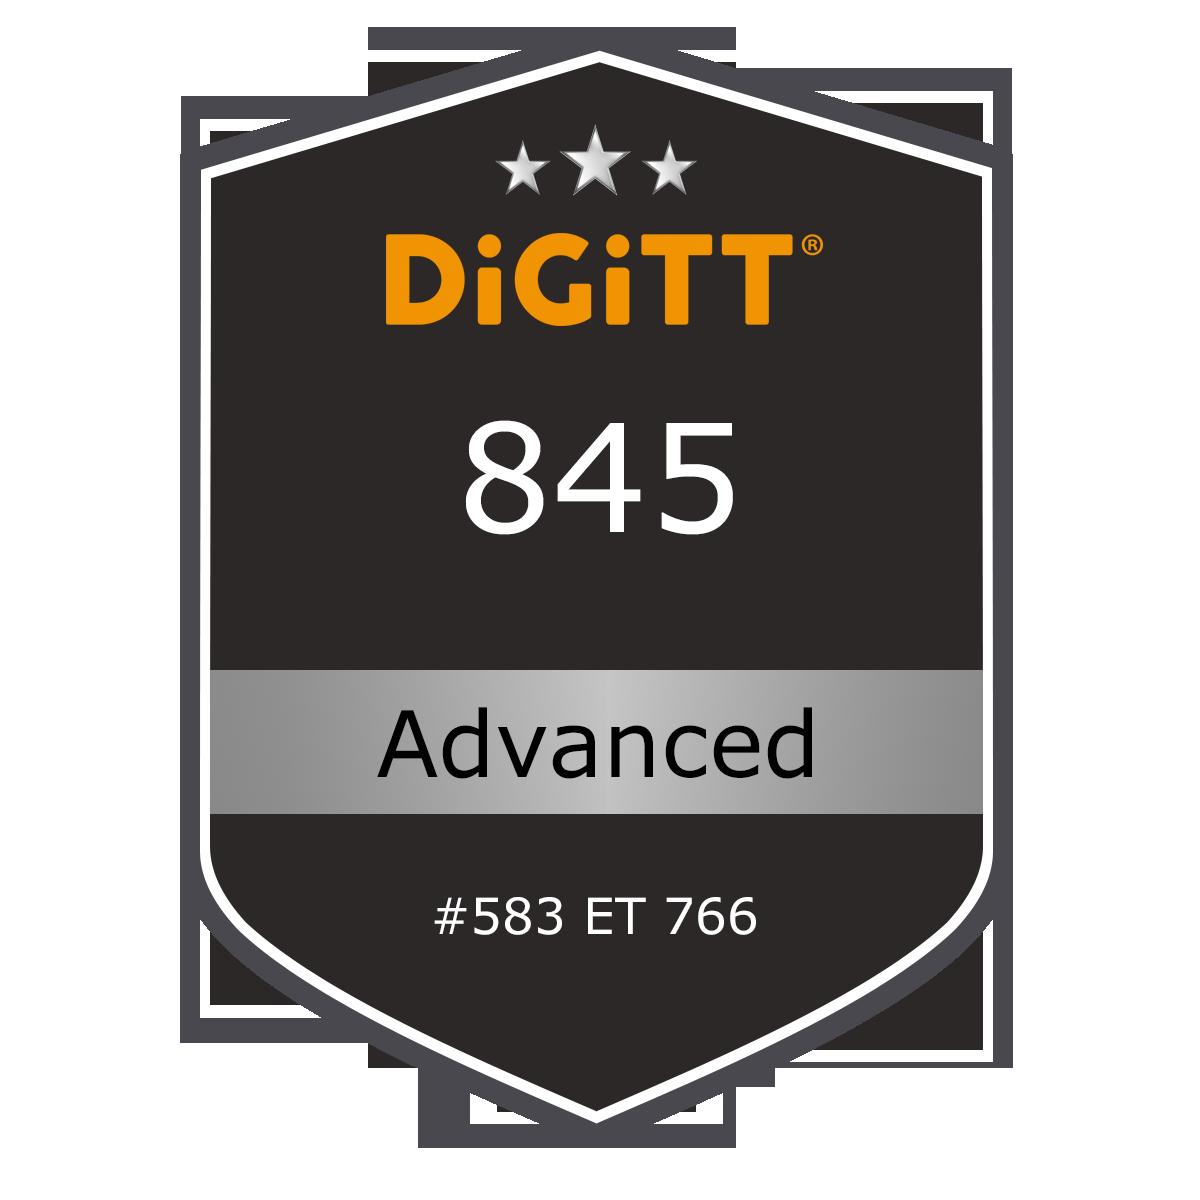 Badge du certificat DiGiTT